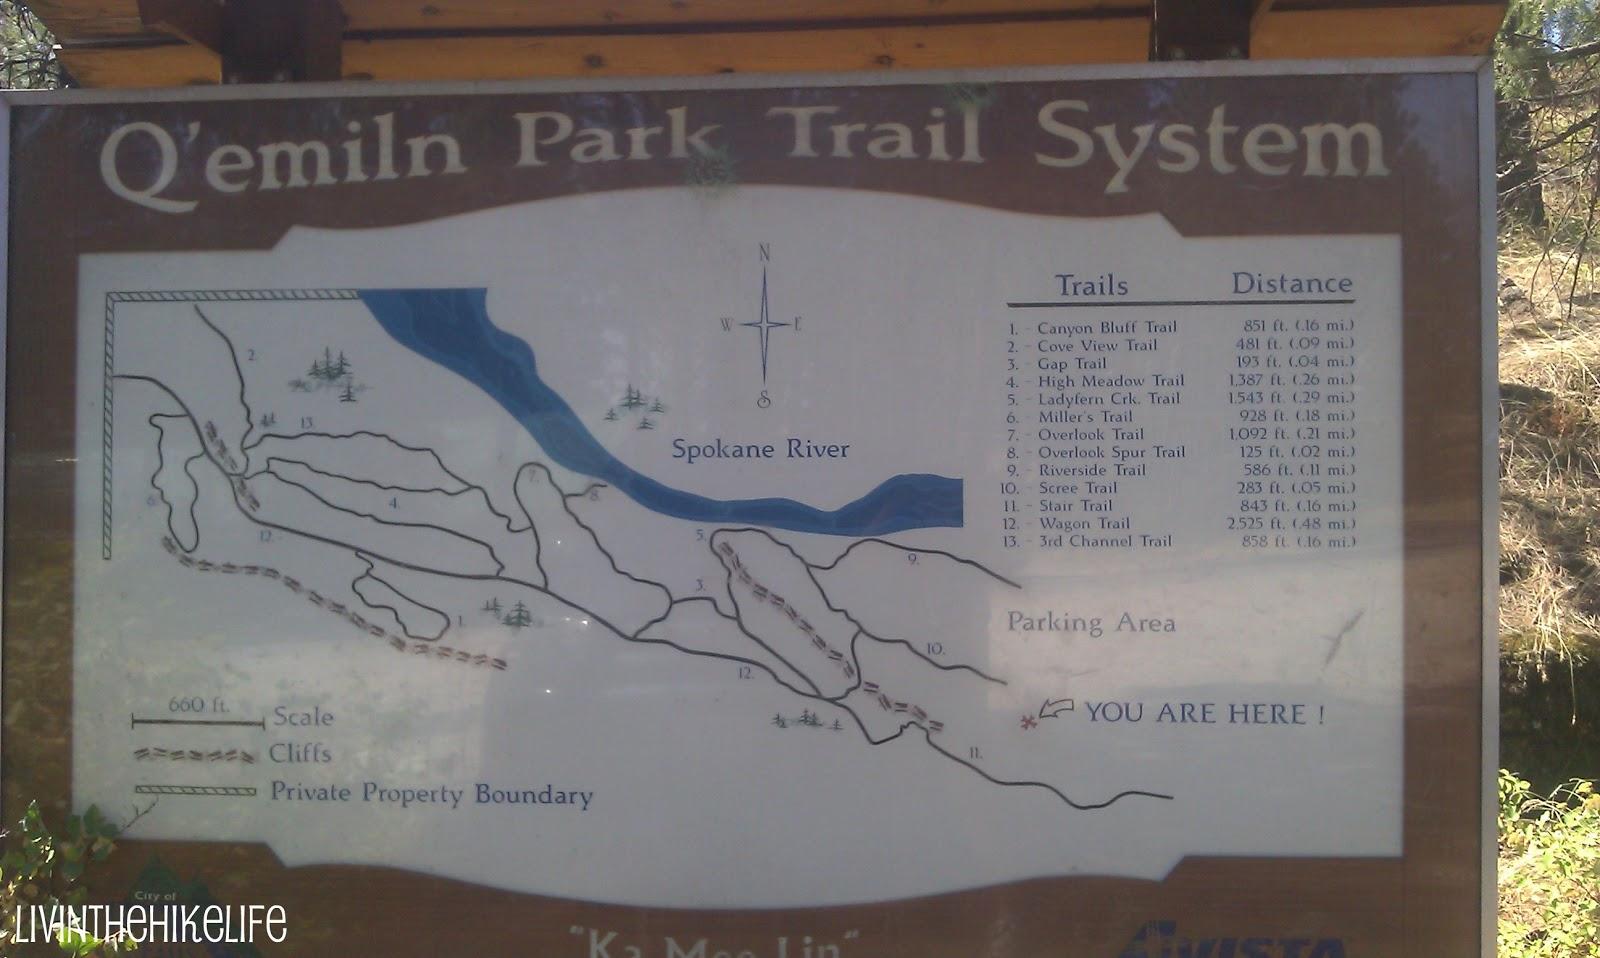 Livin the Hike Life: Q'emiln Park Post Falls Idaho on